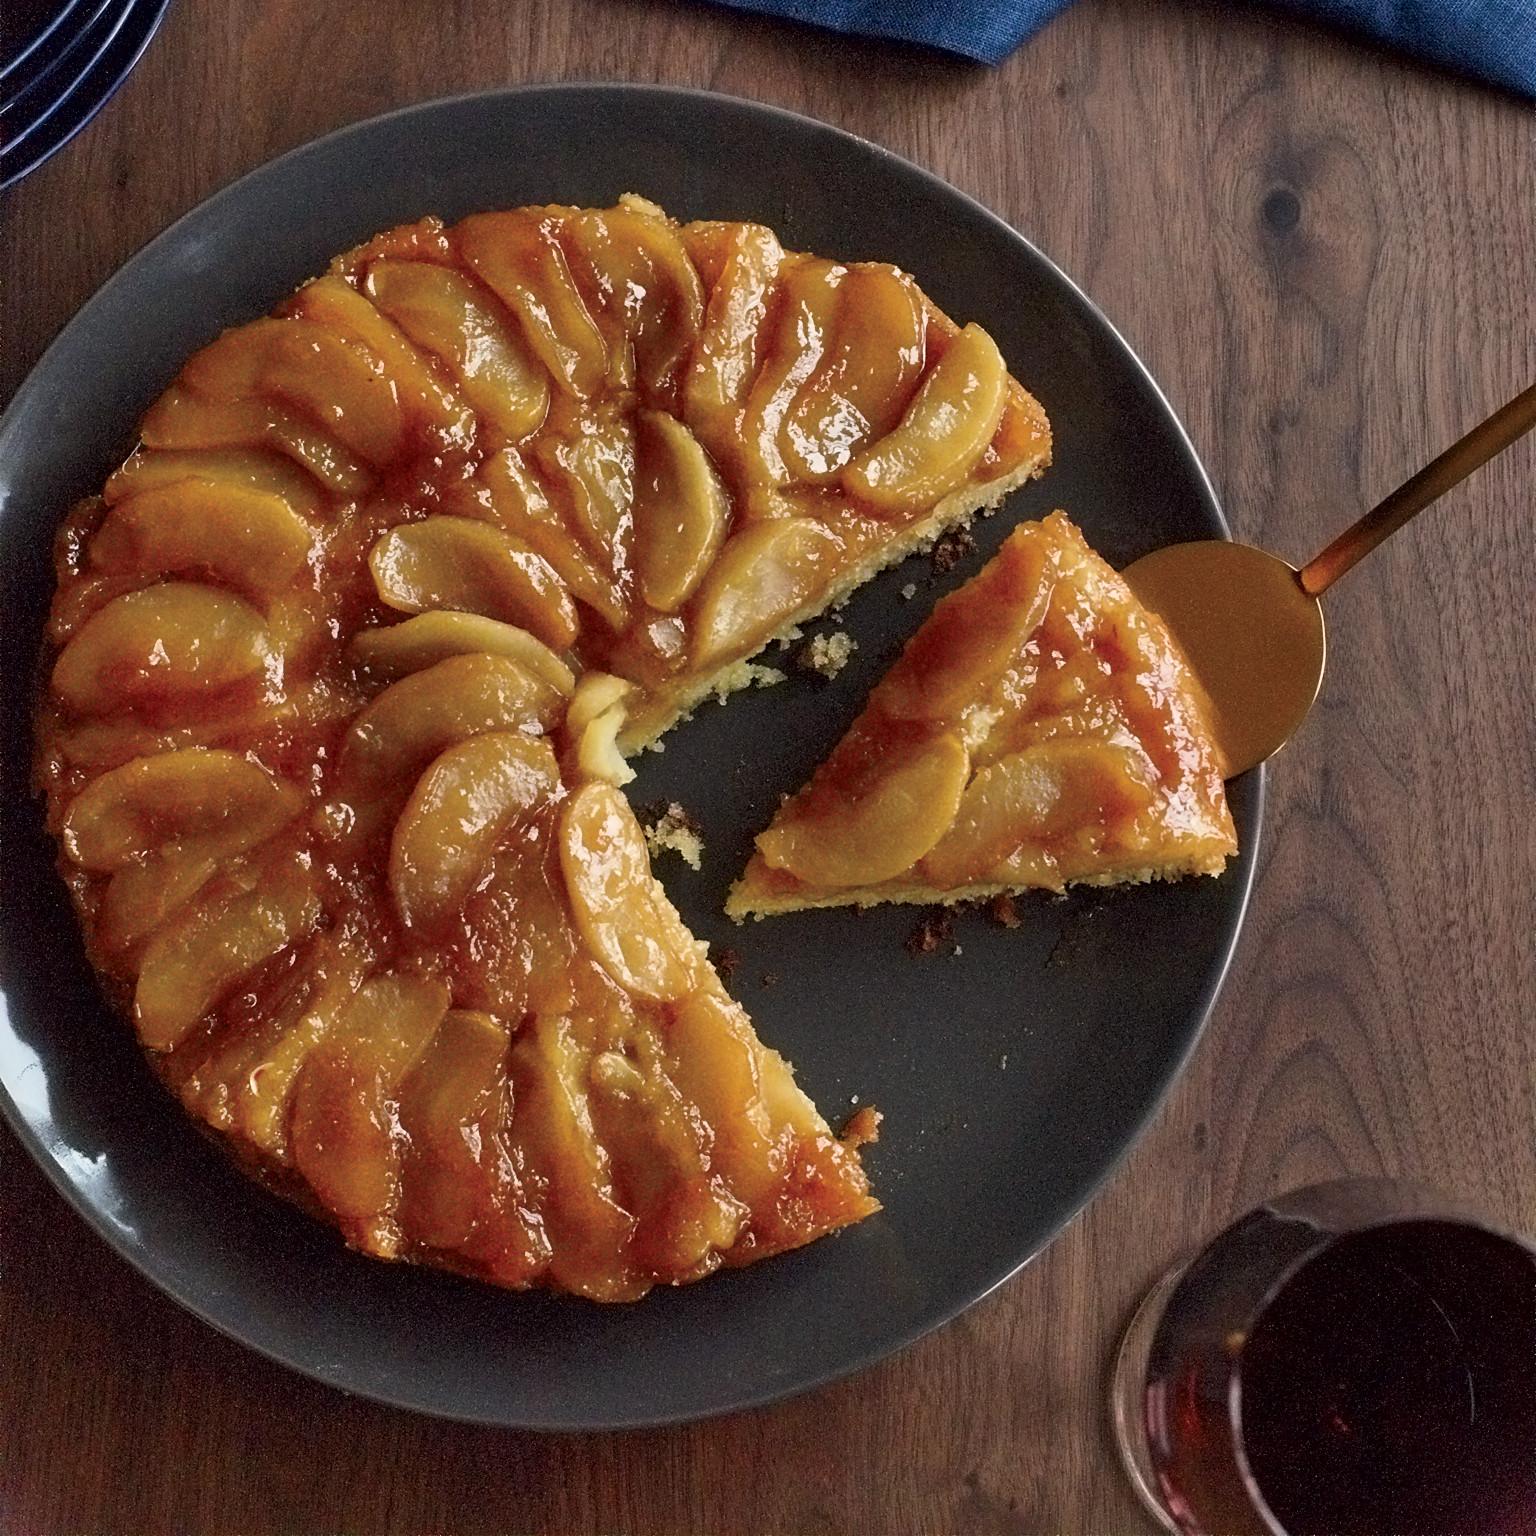 Fall Apple Recipes  Maple Apple Upside Down Cake Recipe Joanne Chang